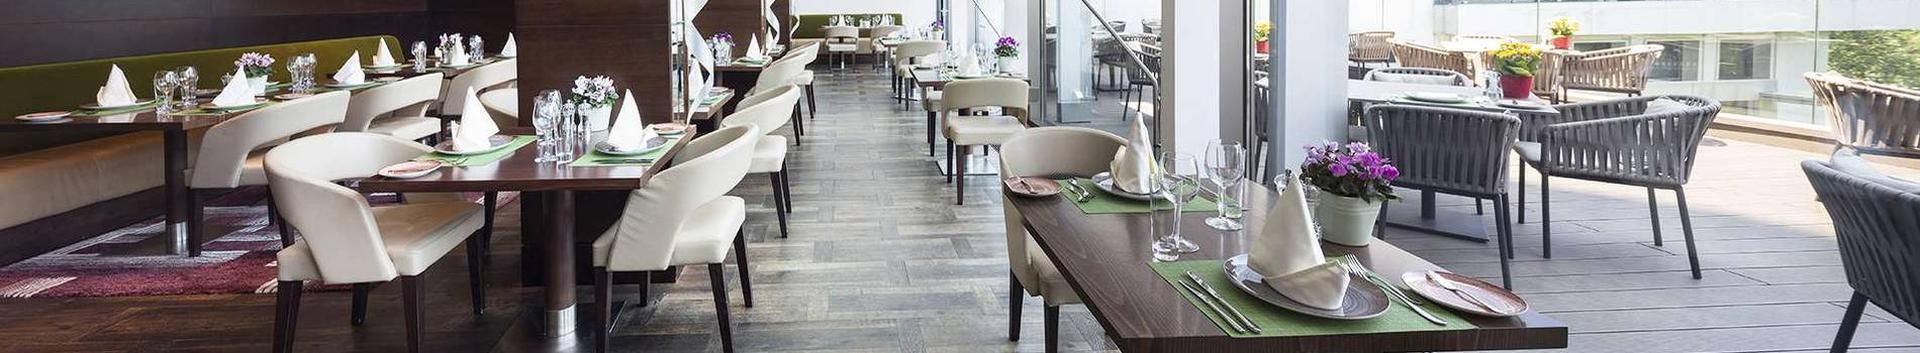 56101_toitlustus-restoran-jm-_36144942_xl.jpg